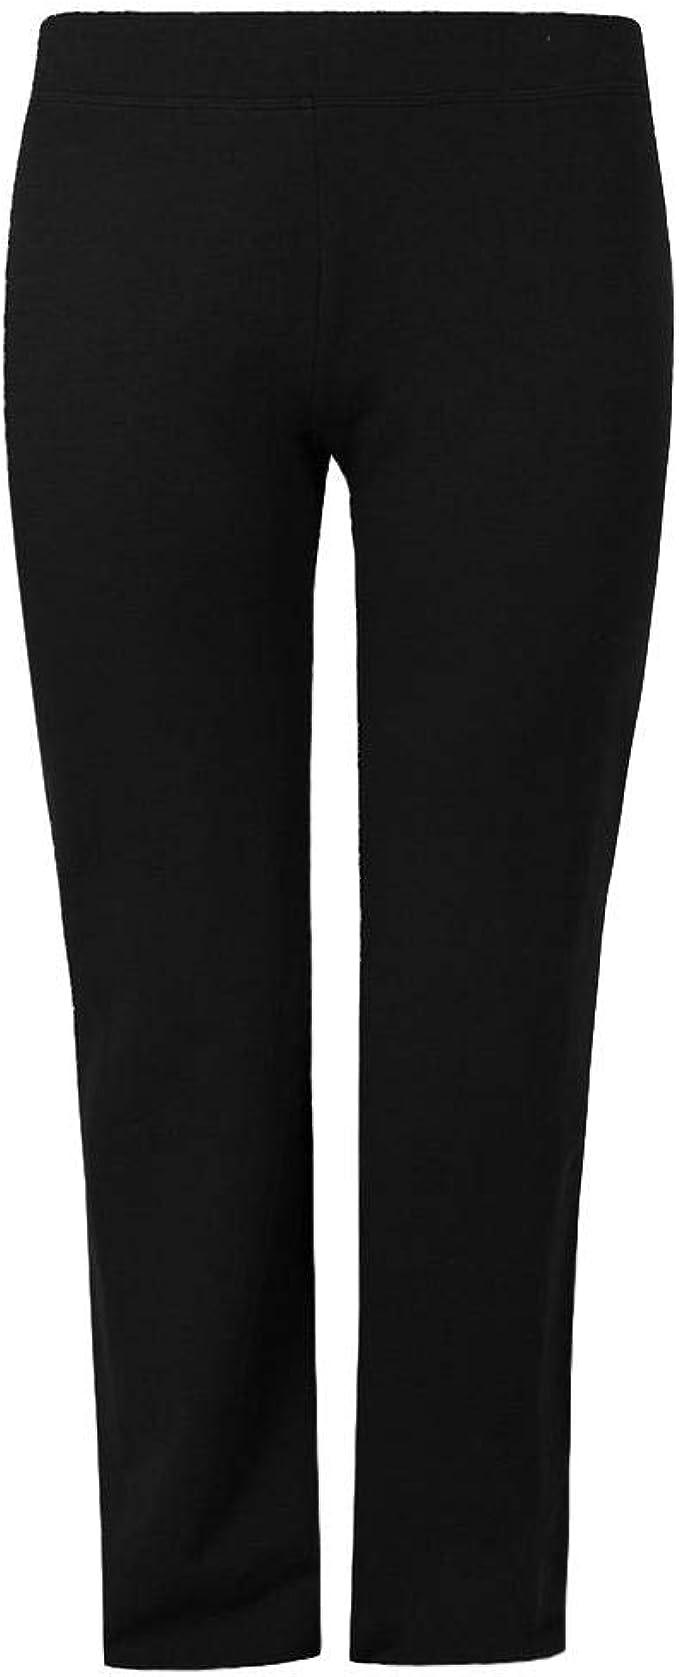 Girls NEW ex Marks /& Spencer M/&S Star Dress /& Leggings Set Age 4-5 y Jersey